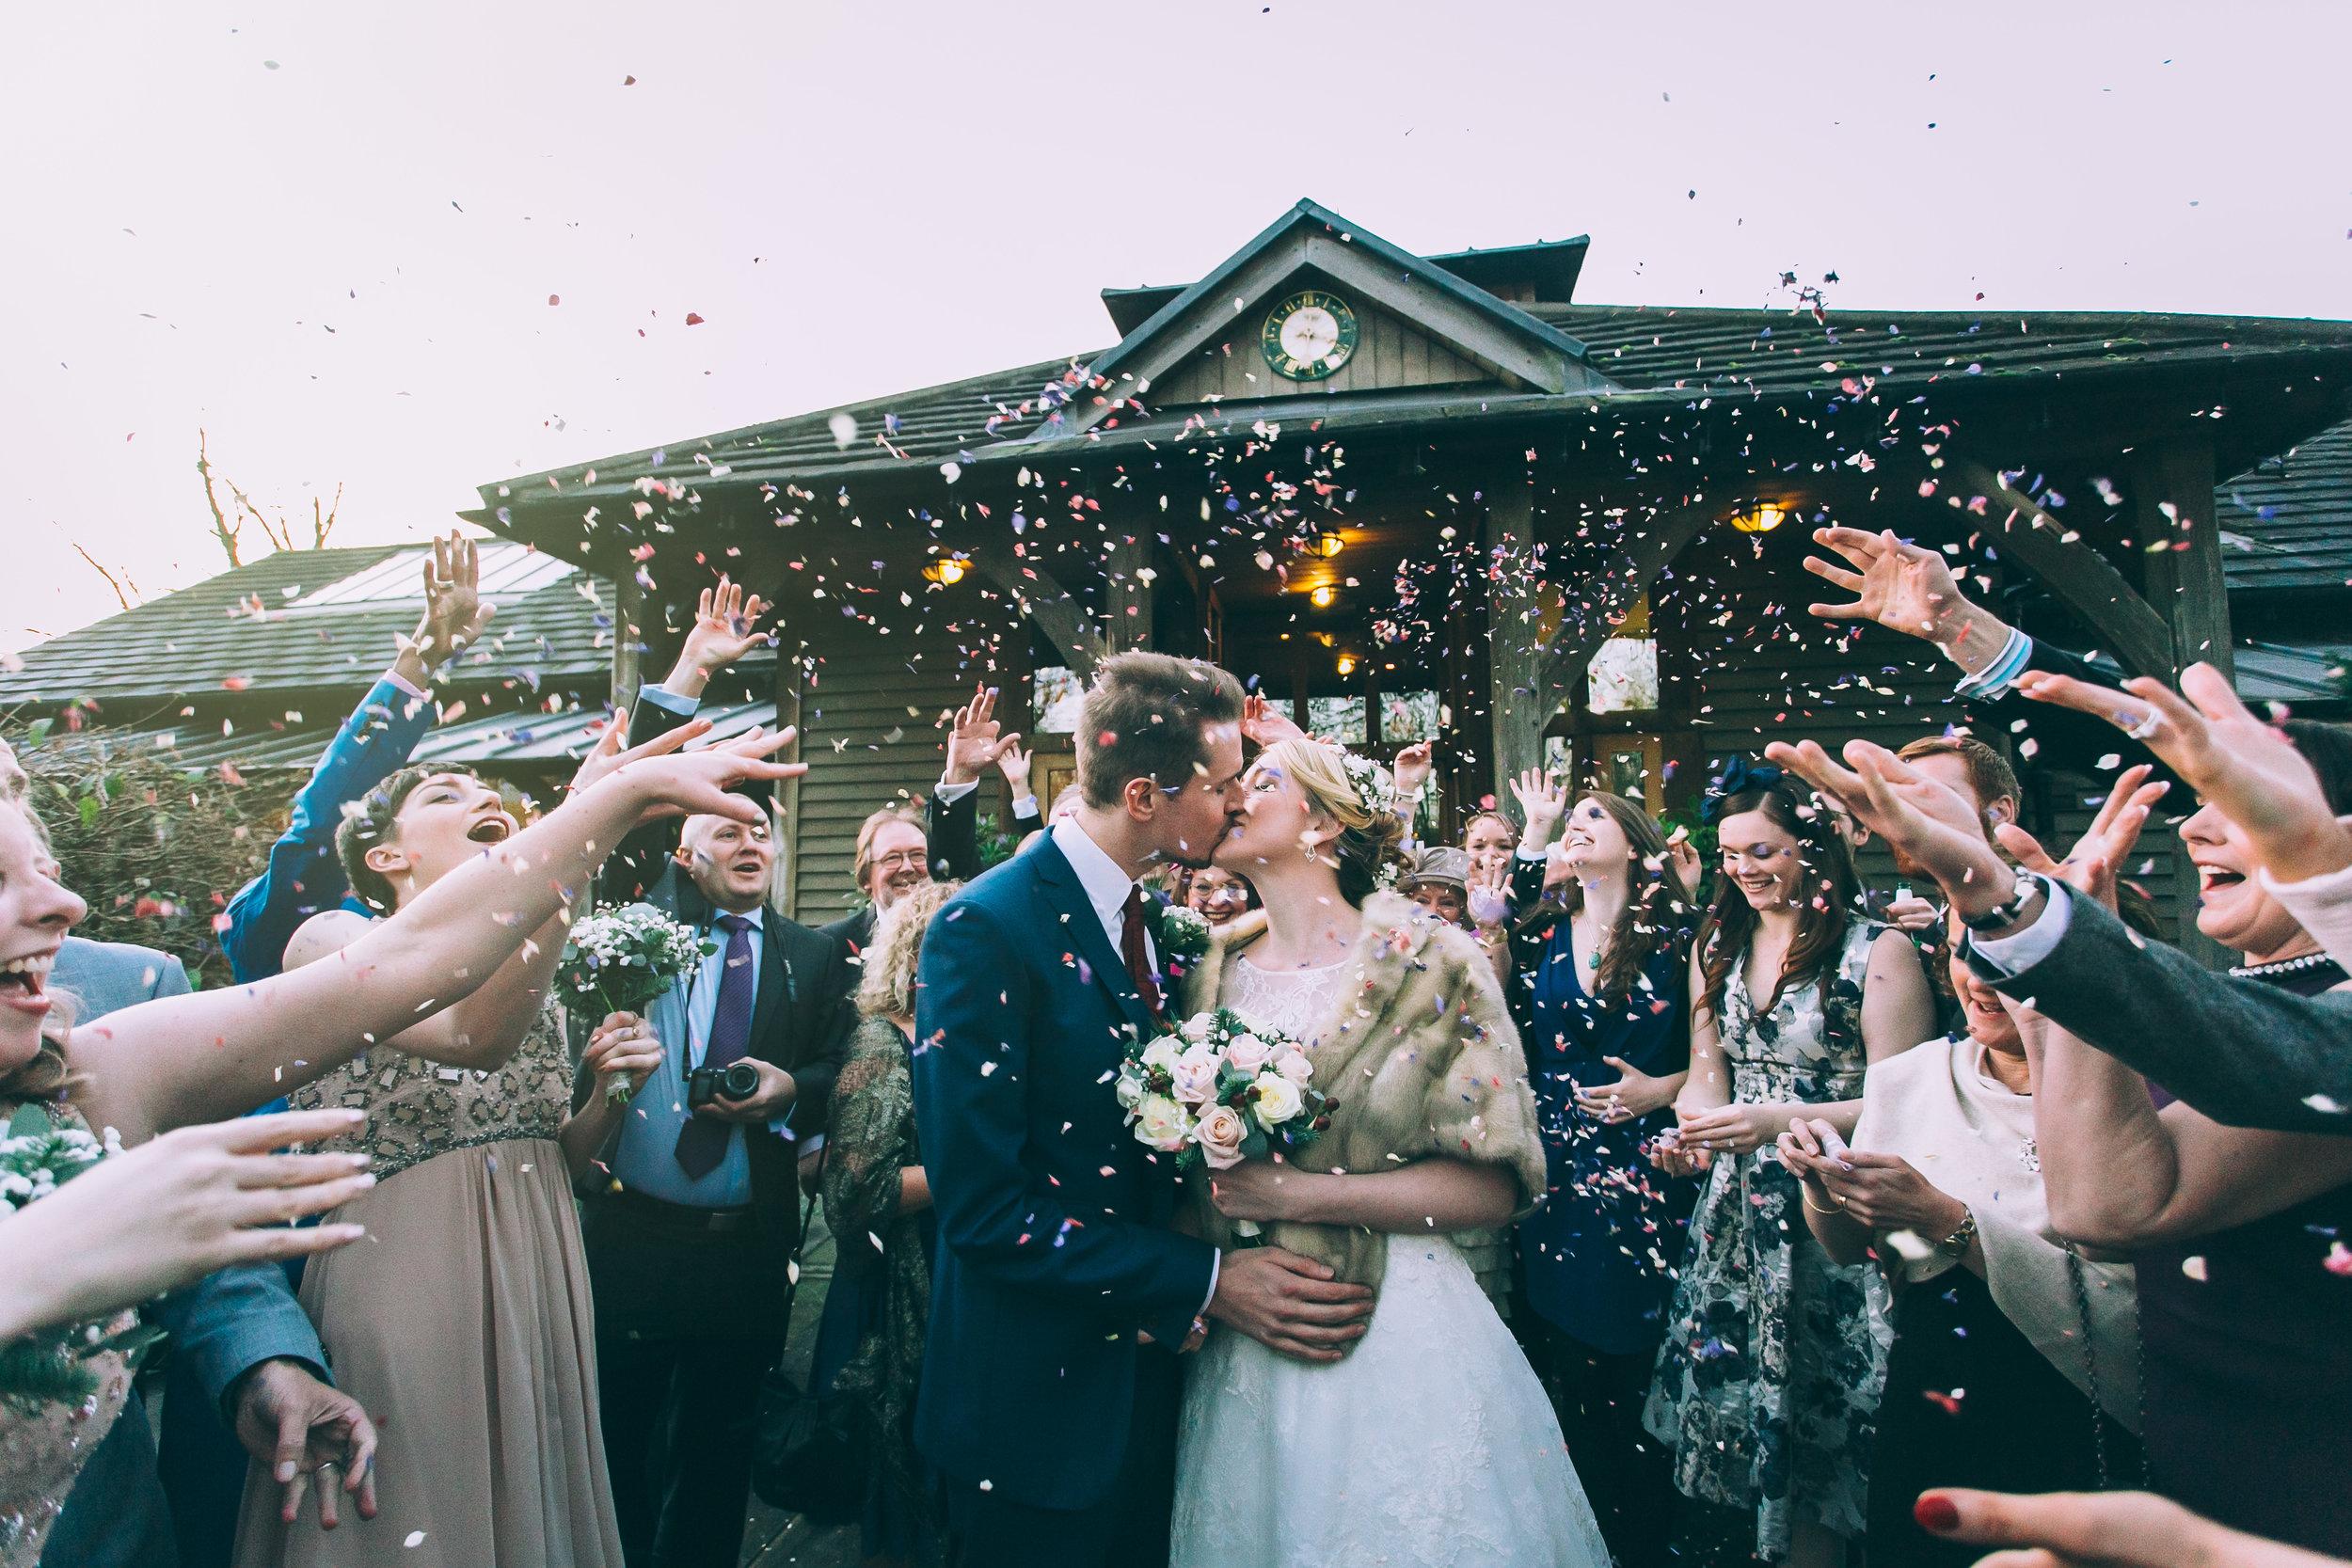 Clare&Iain-Wedding-at-The-Oak-Tree-Over-tom-biddle-photographer-tb329.jpg